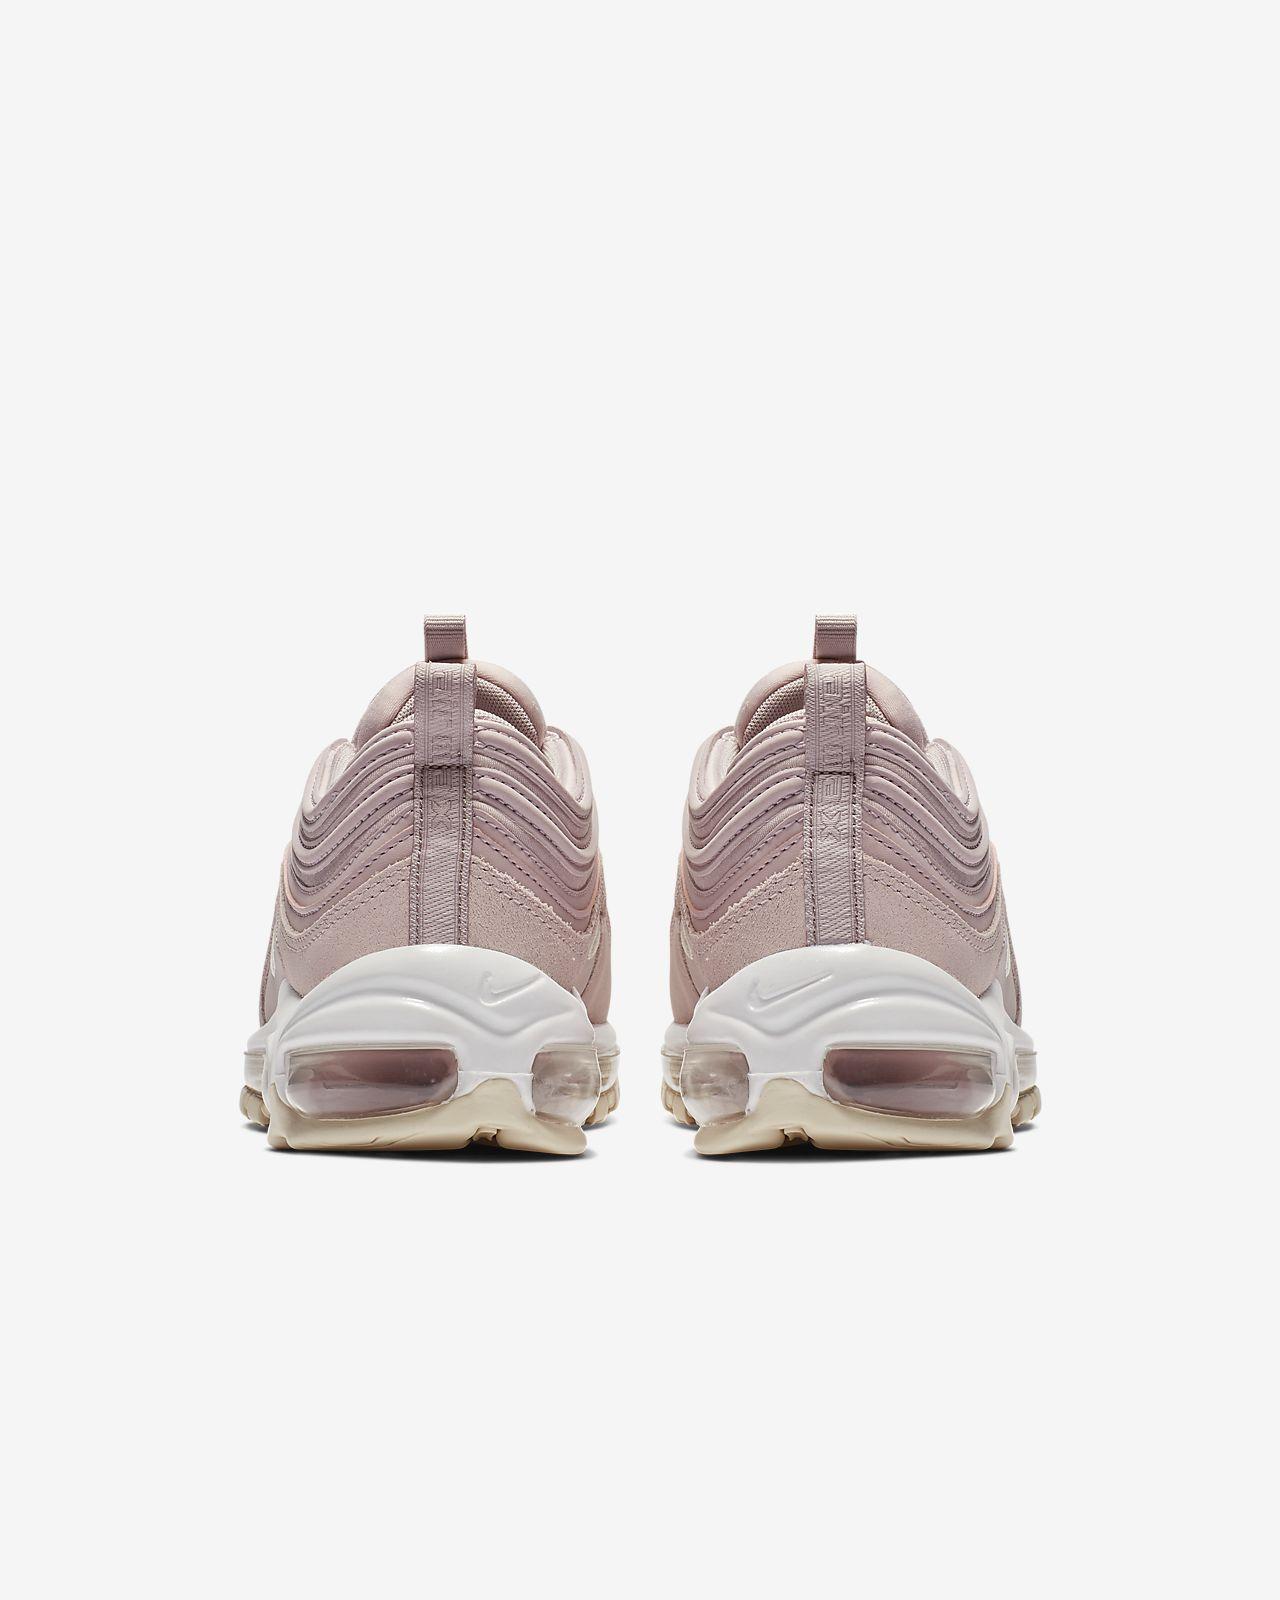 f51089d2bfc Nike Air Max 97 Premium Women s Shoe. Nike.com CH